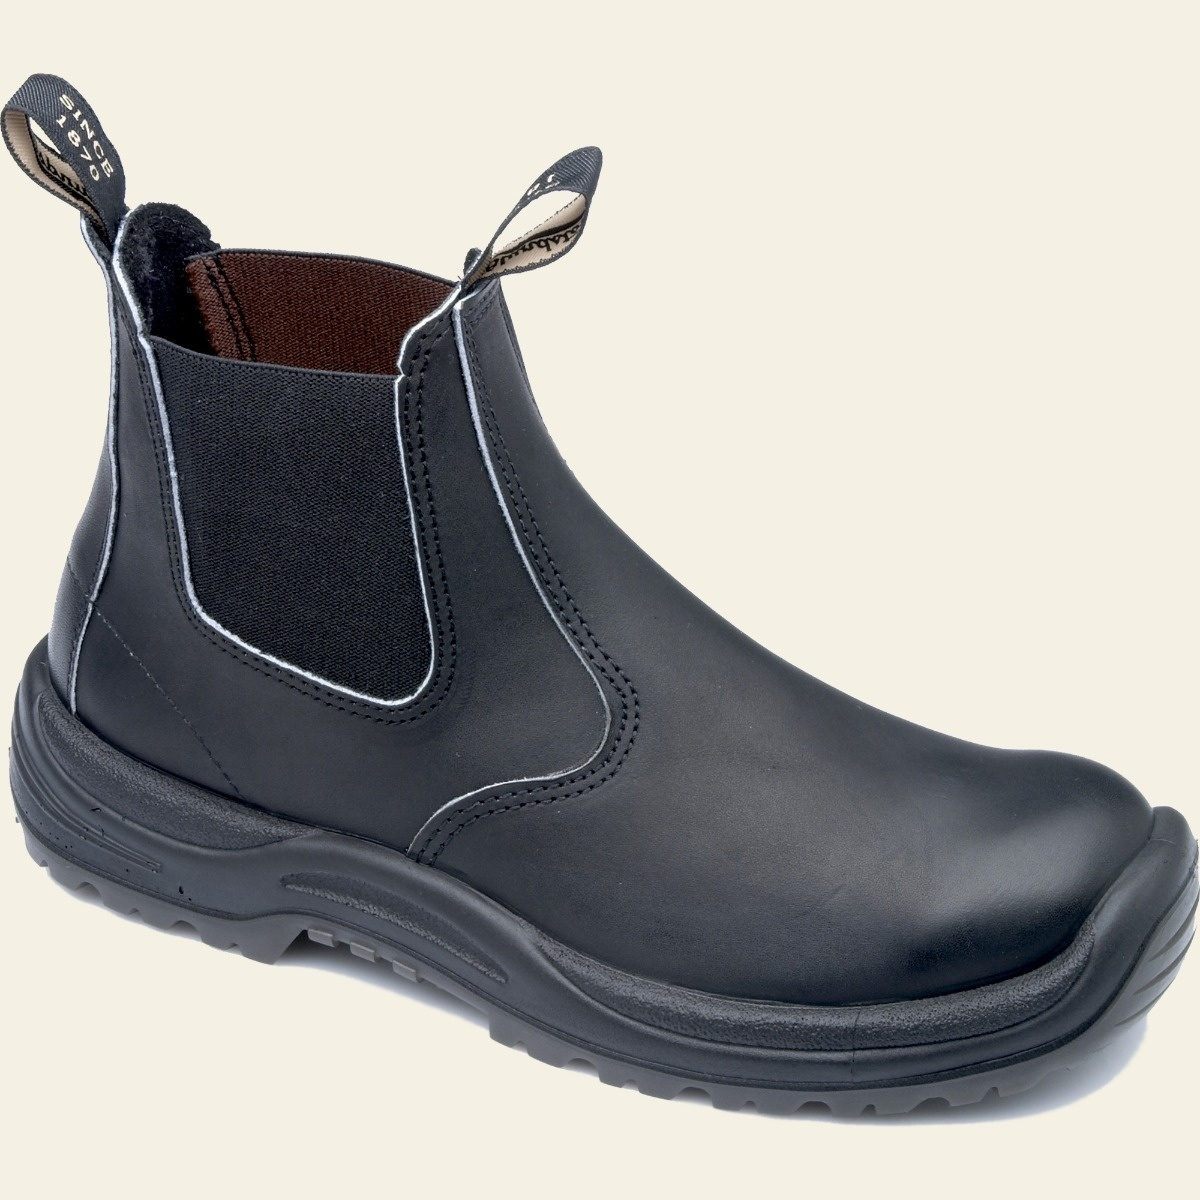 Boots, Unisex Style 491